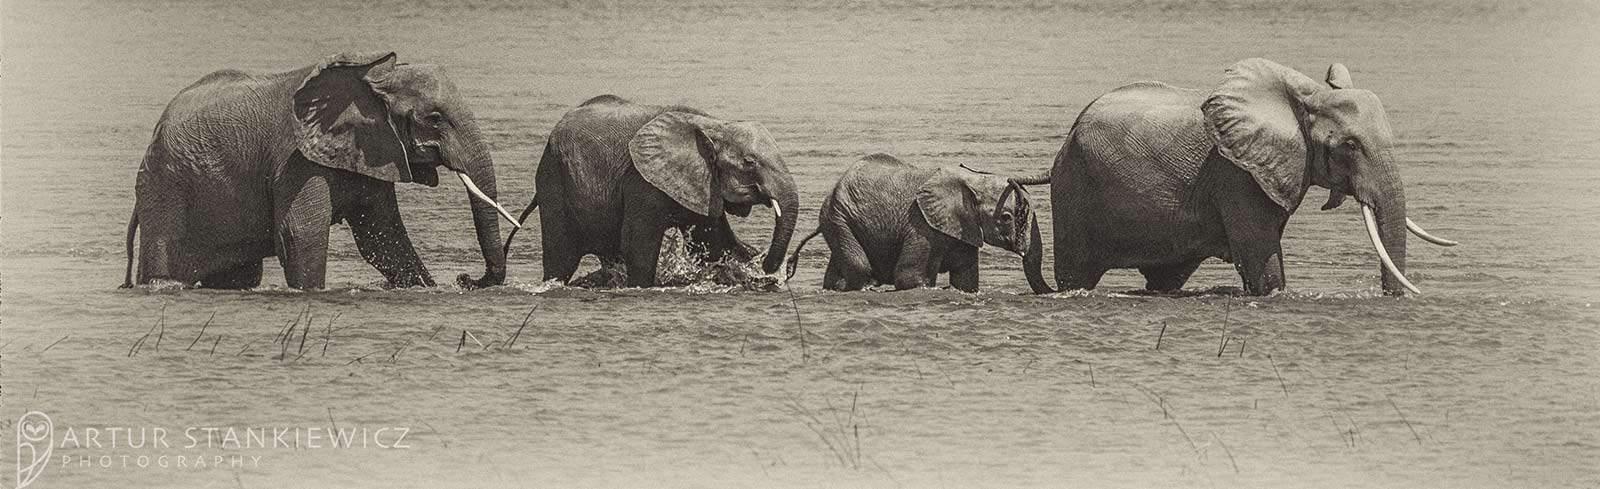 Elephants Artur Stankiewicz Header